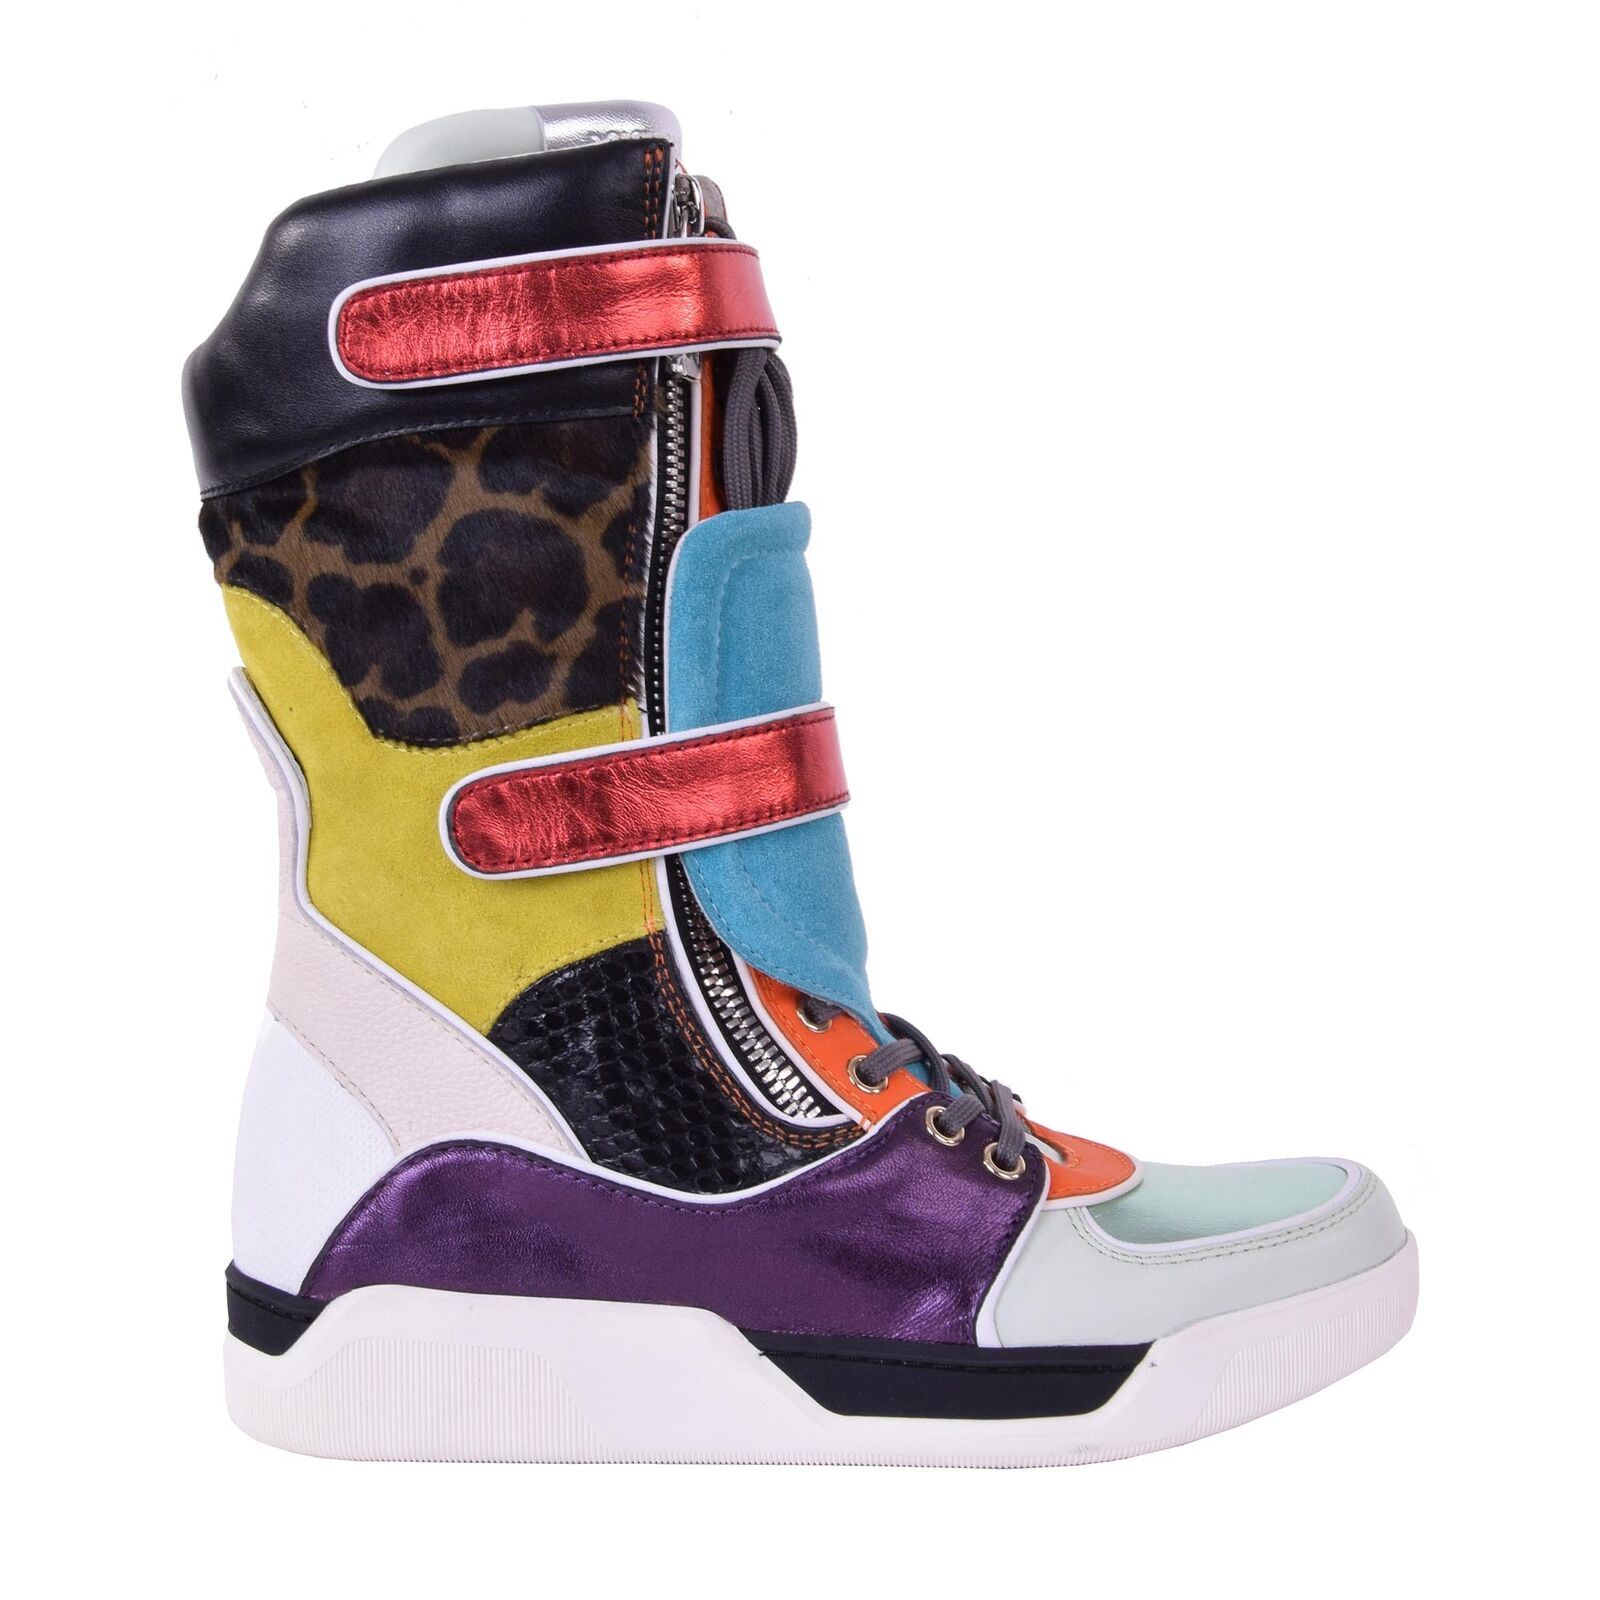 Dolce & Gabbana patchwork leo High-Top cortos botas botas negro azul 05873